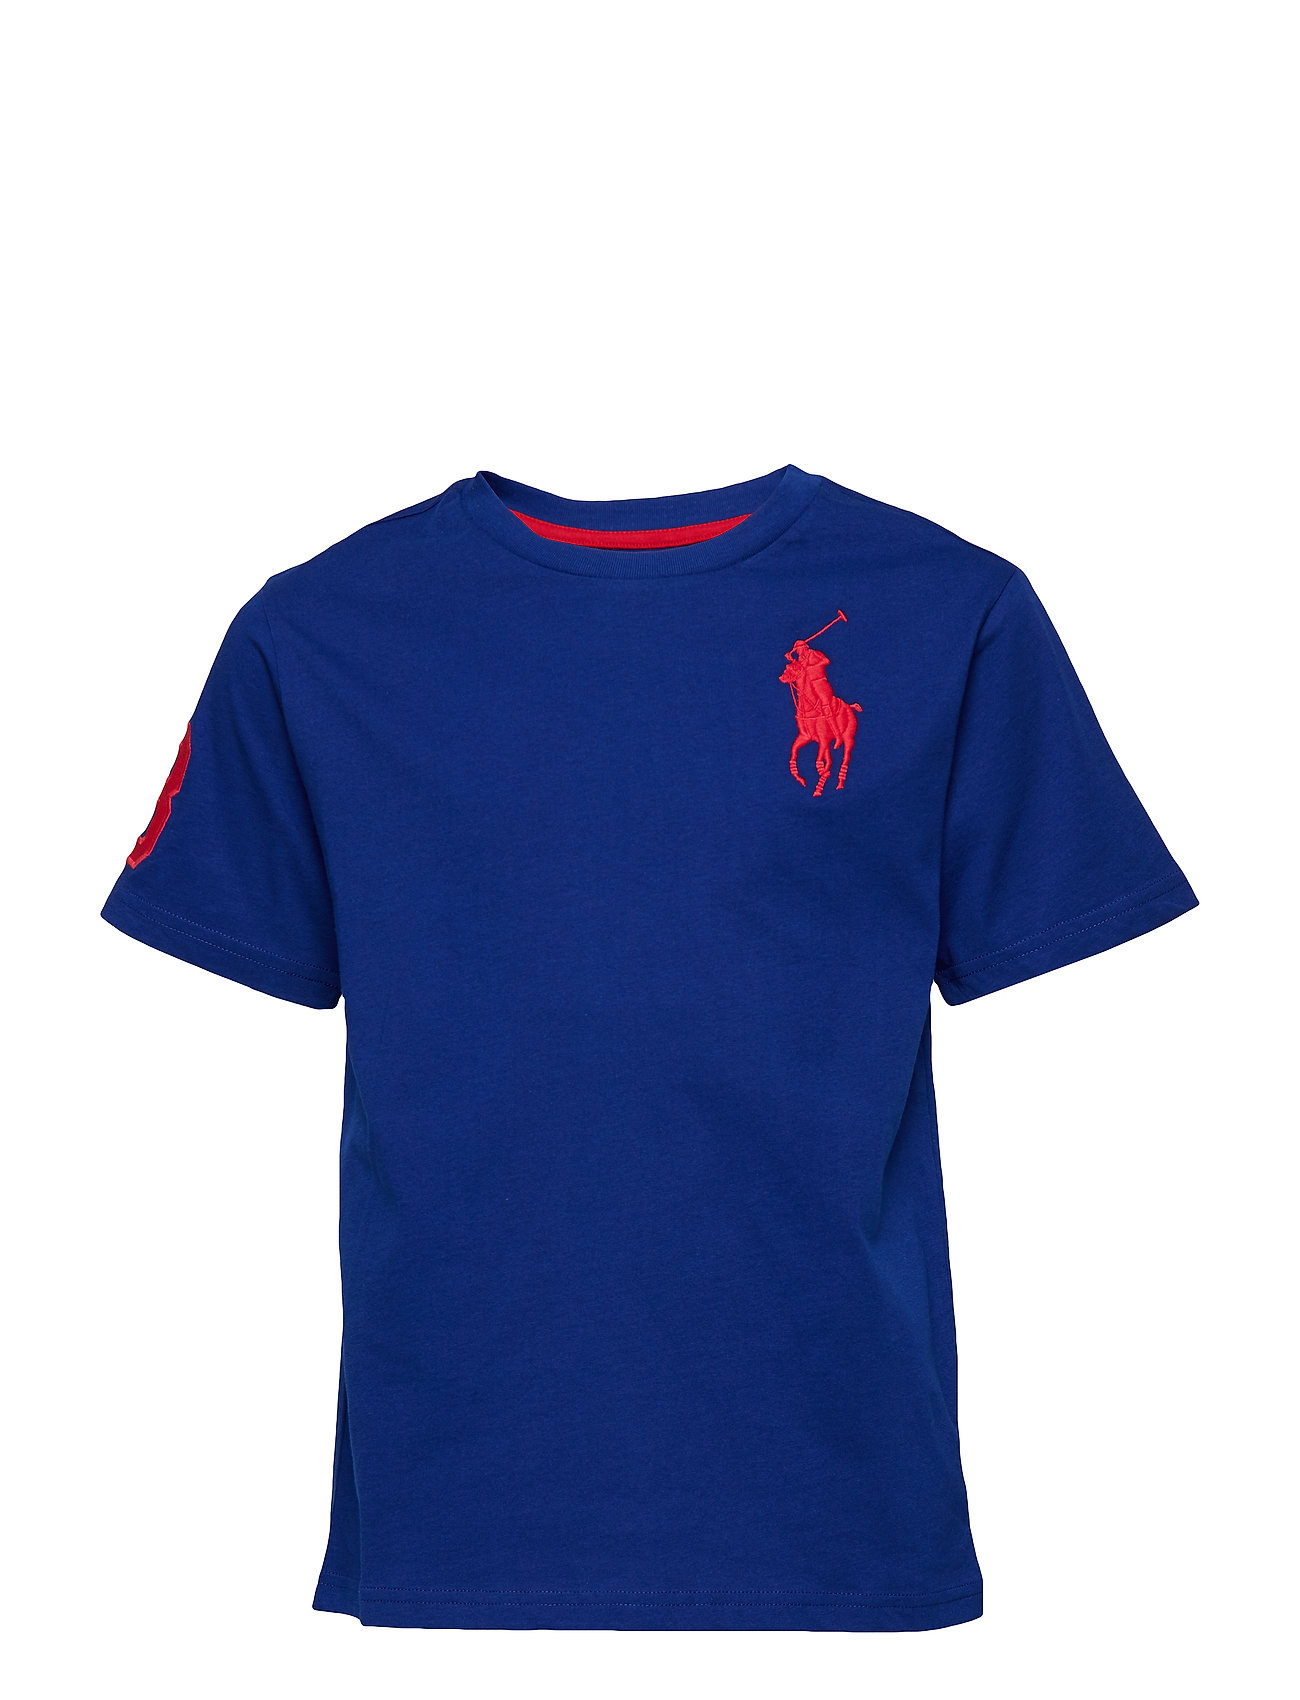 Jersey-ss Cn-tp-tsh (Heritage Royal) (42 €) - Ralph Lauren Kids ... 6e8b87b9e